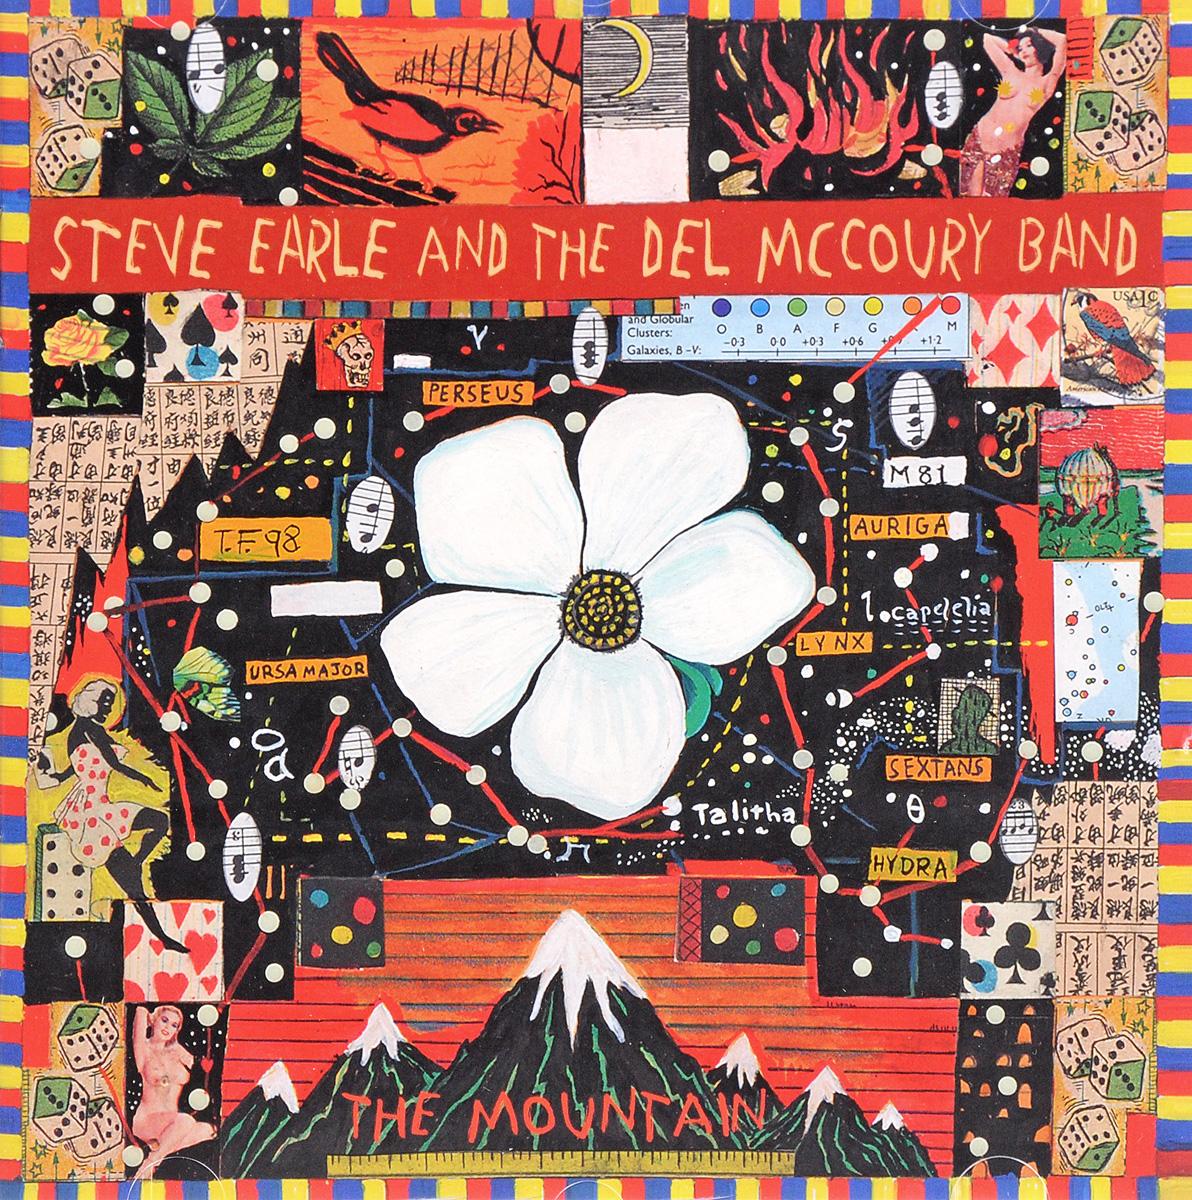 Стив Эрль,The Del Mccoury Band Steve Earle And The Del McCoury Band. The Mountain стив форберт steve forbert the place and time